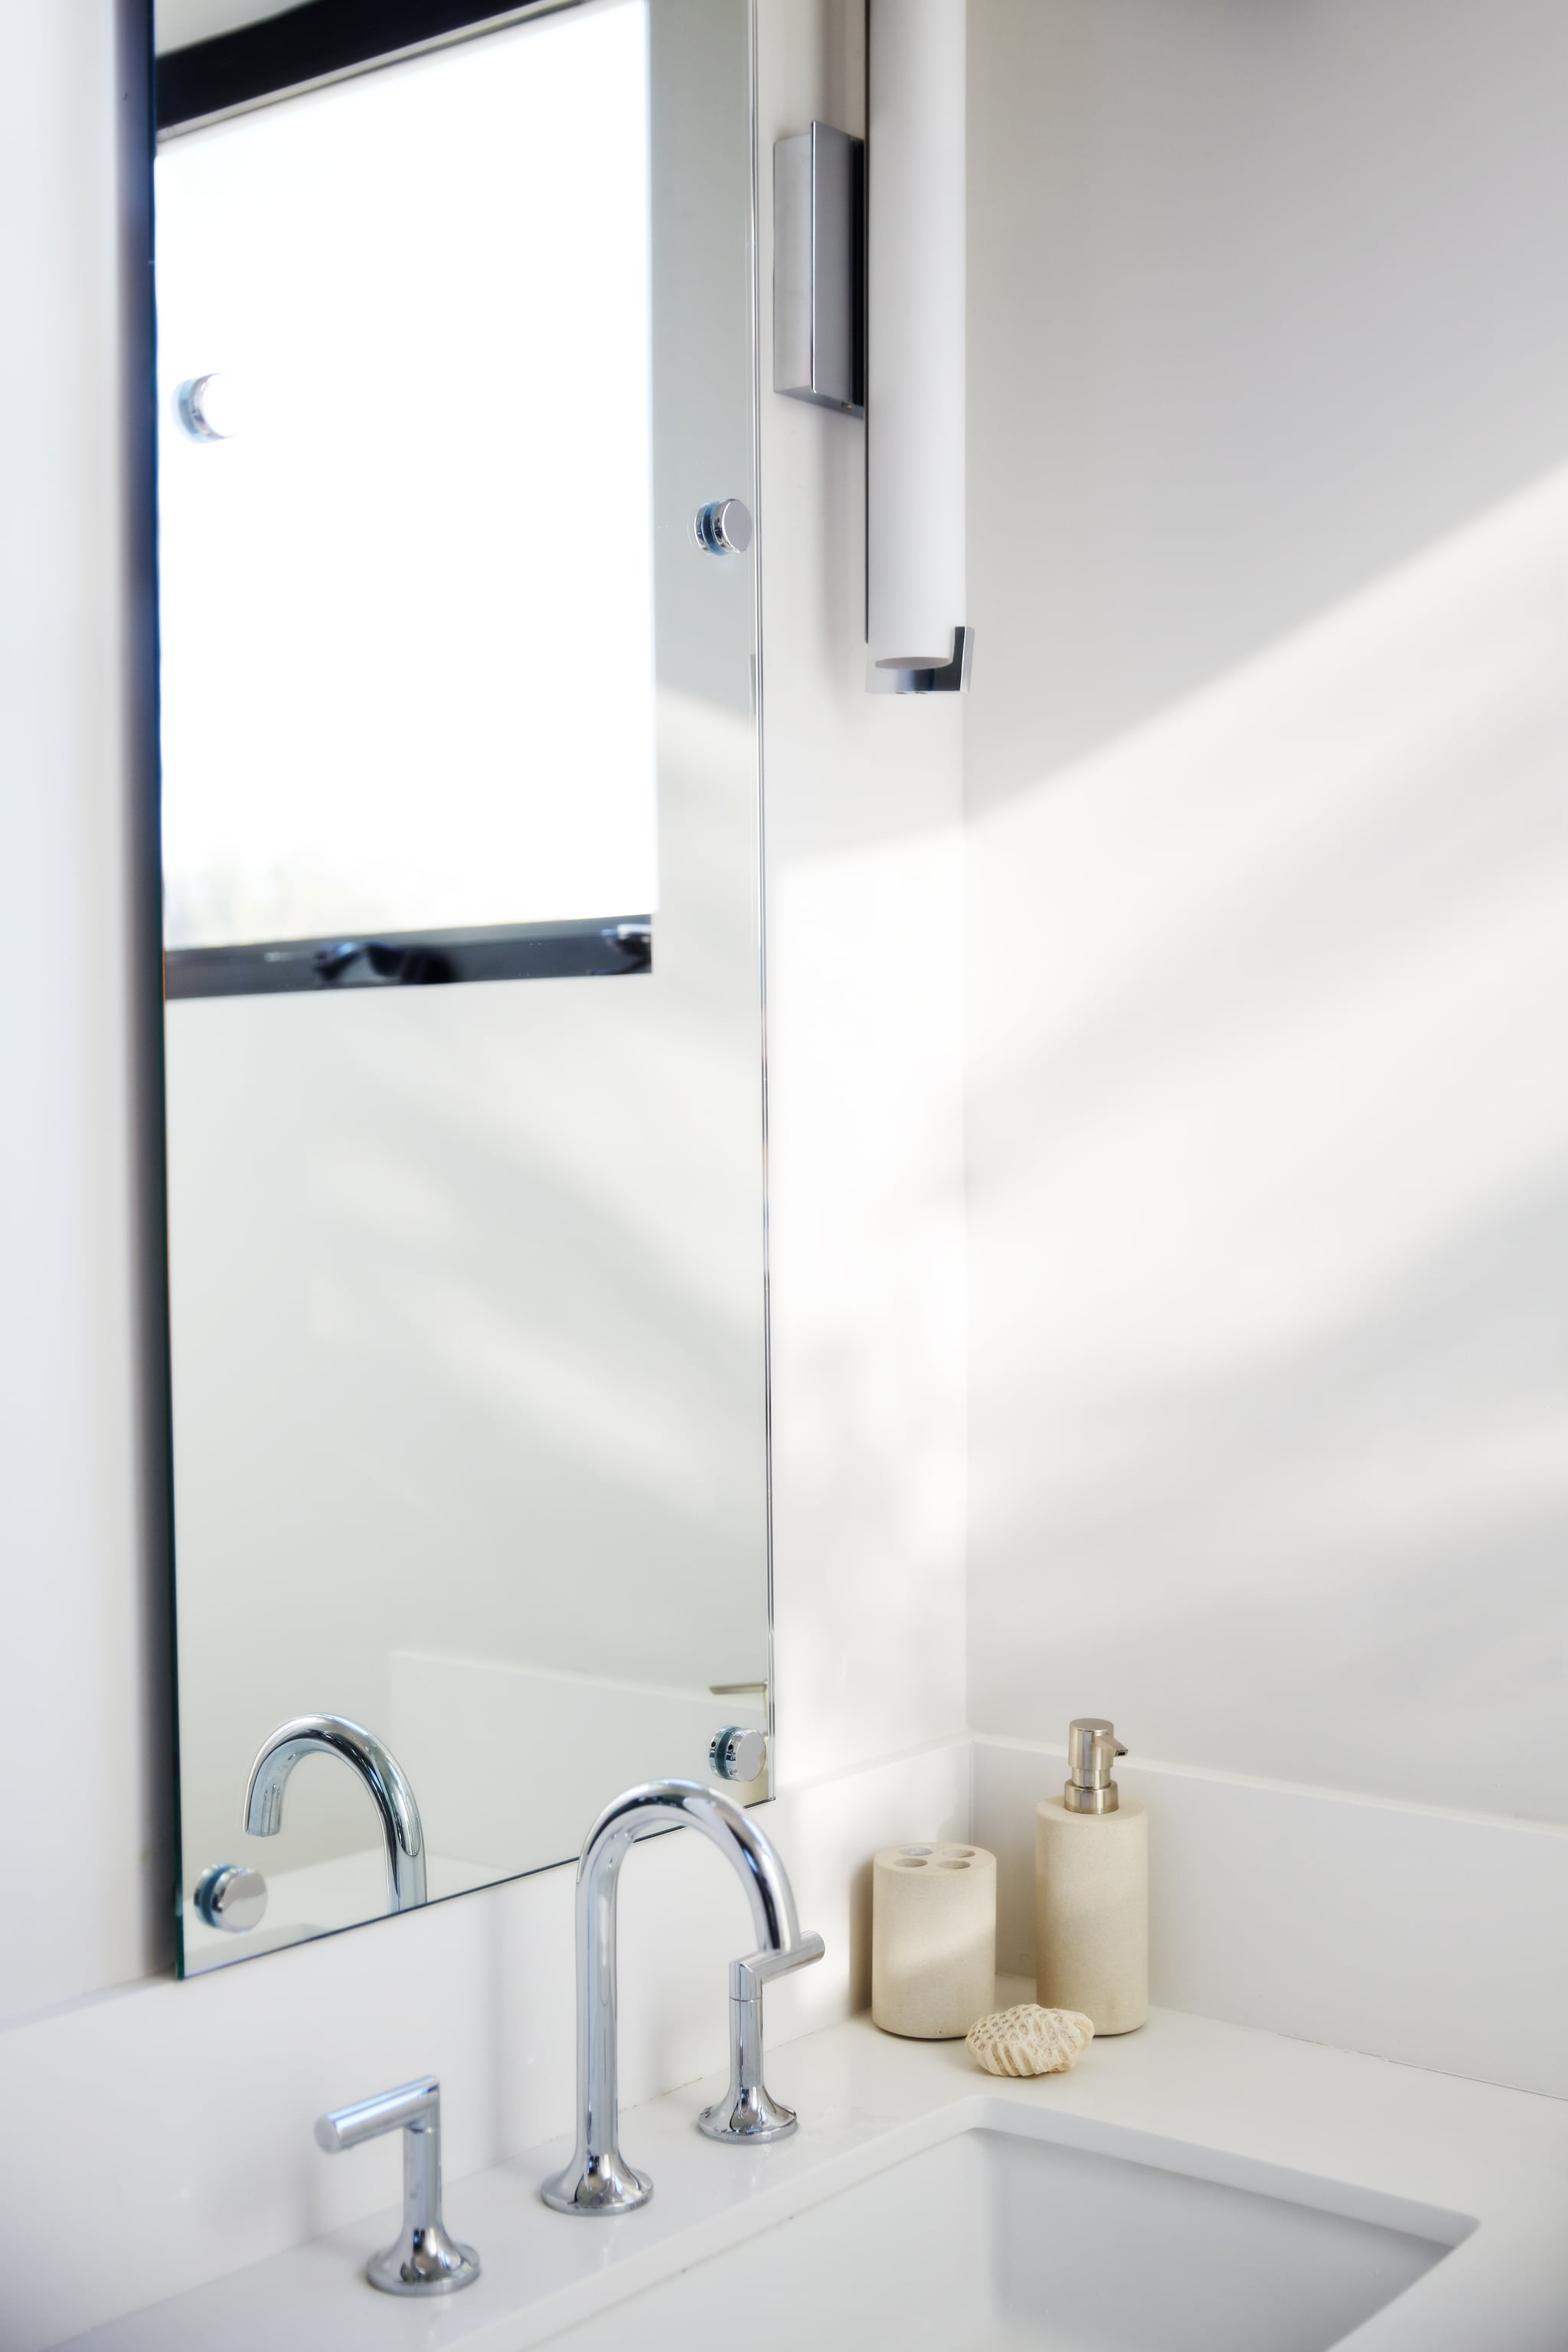 Homemade Bathroom CleanerPOPSUGAR Smart Living